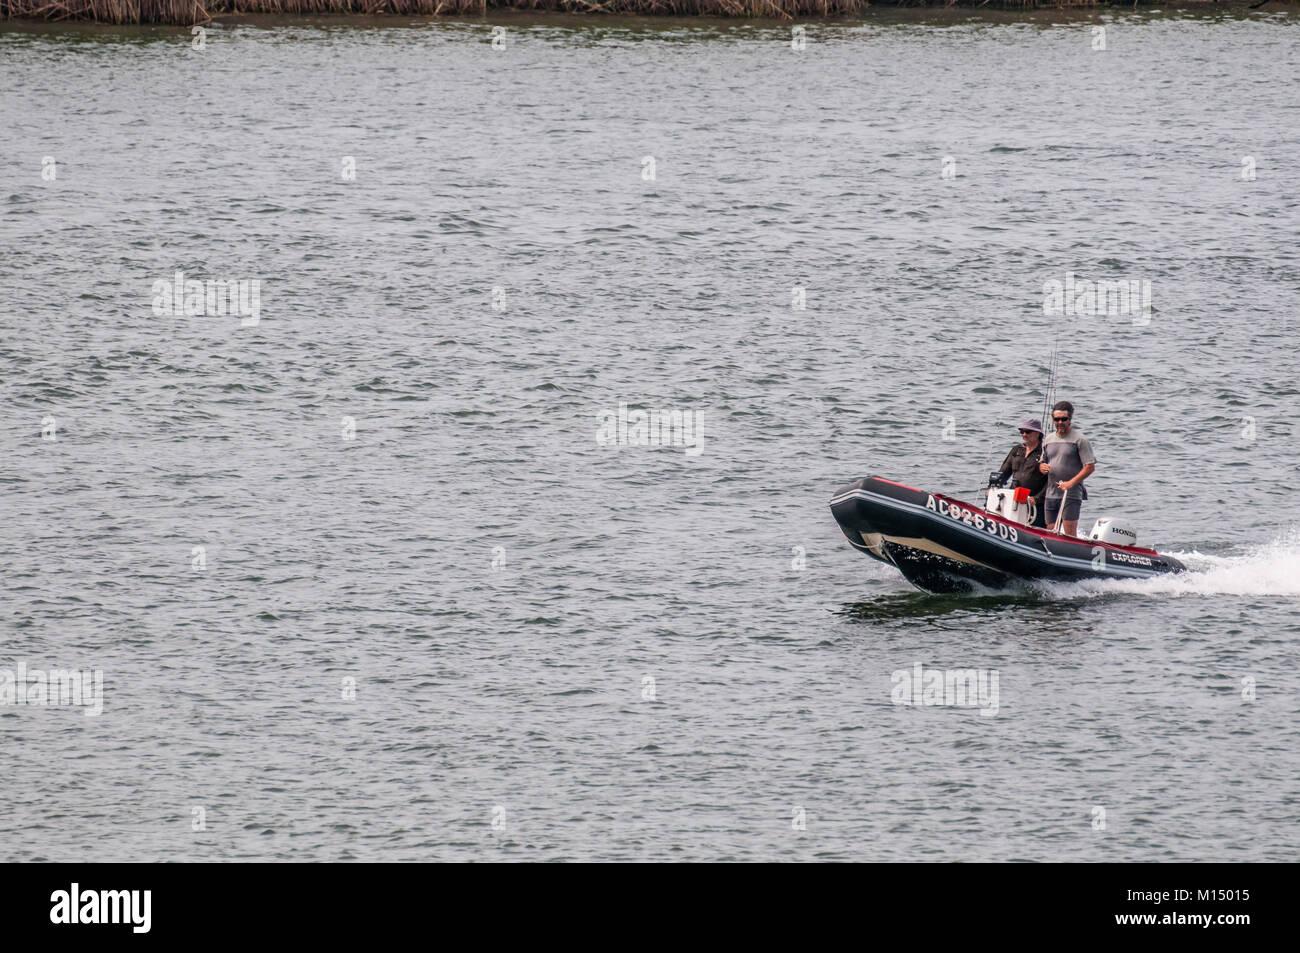 boat sailing on the river Ebro with tourists , Ebro Delta, Tarragona, Catalonia, Spain Stock Photo